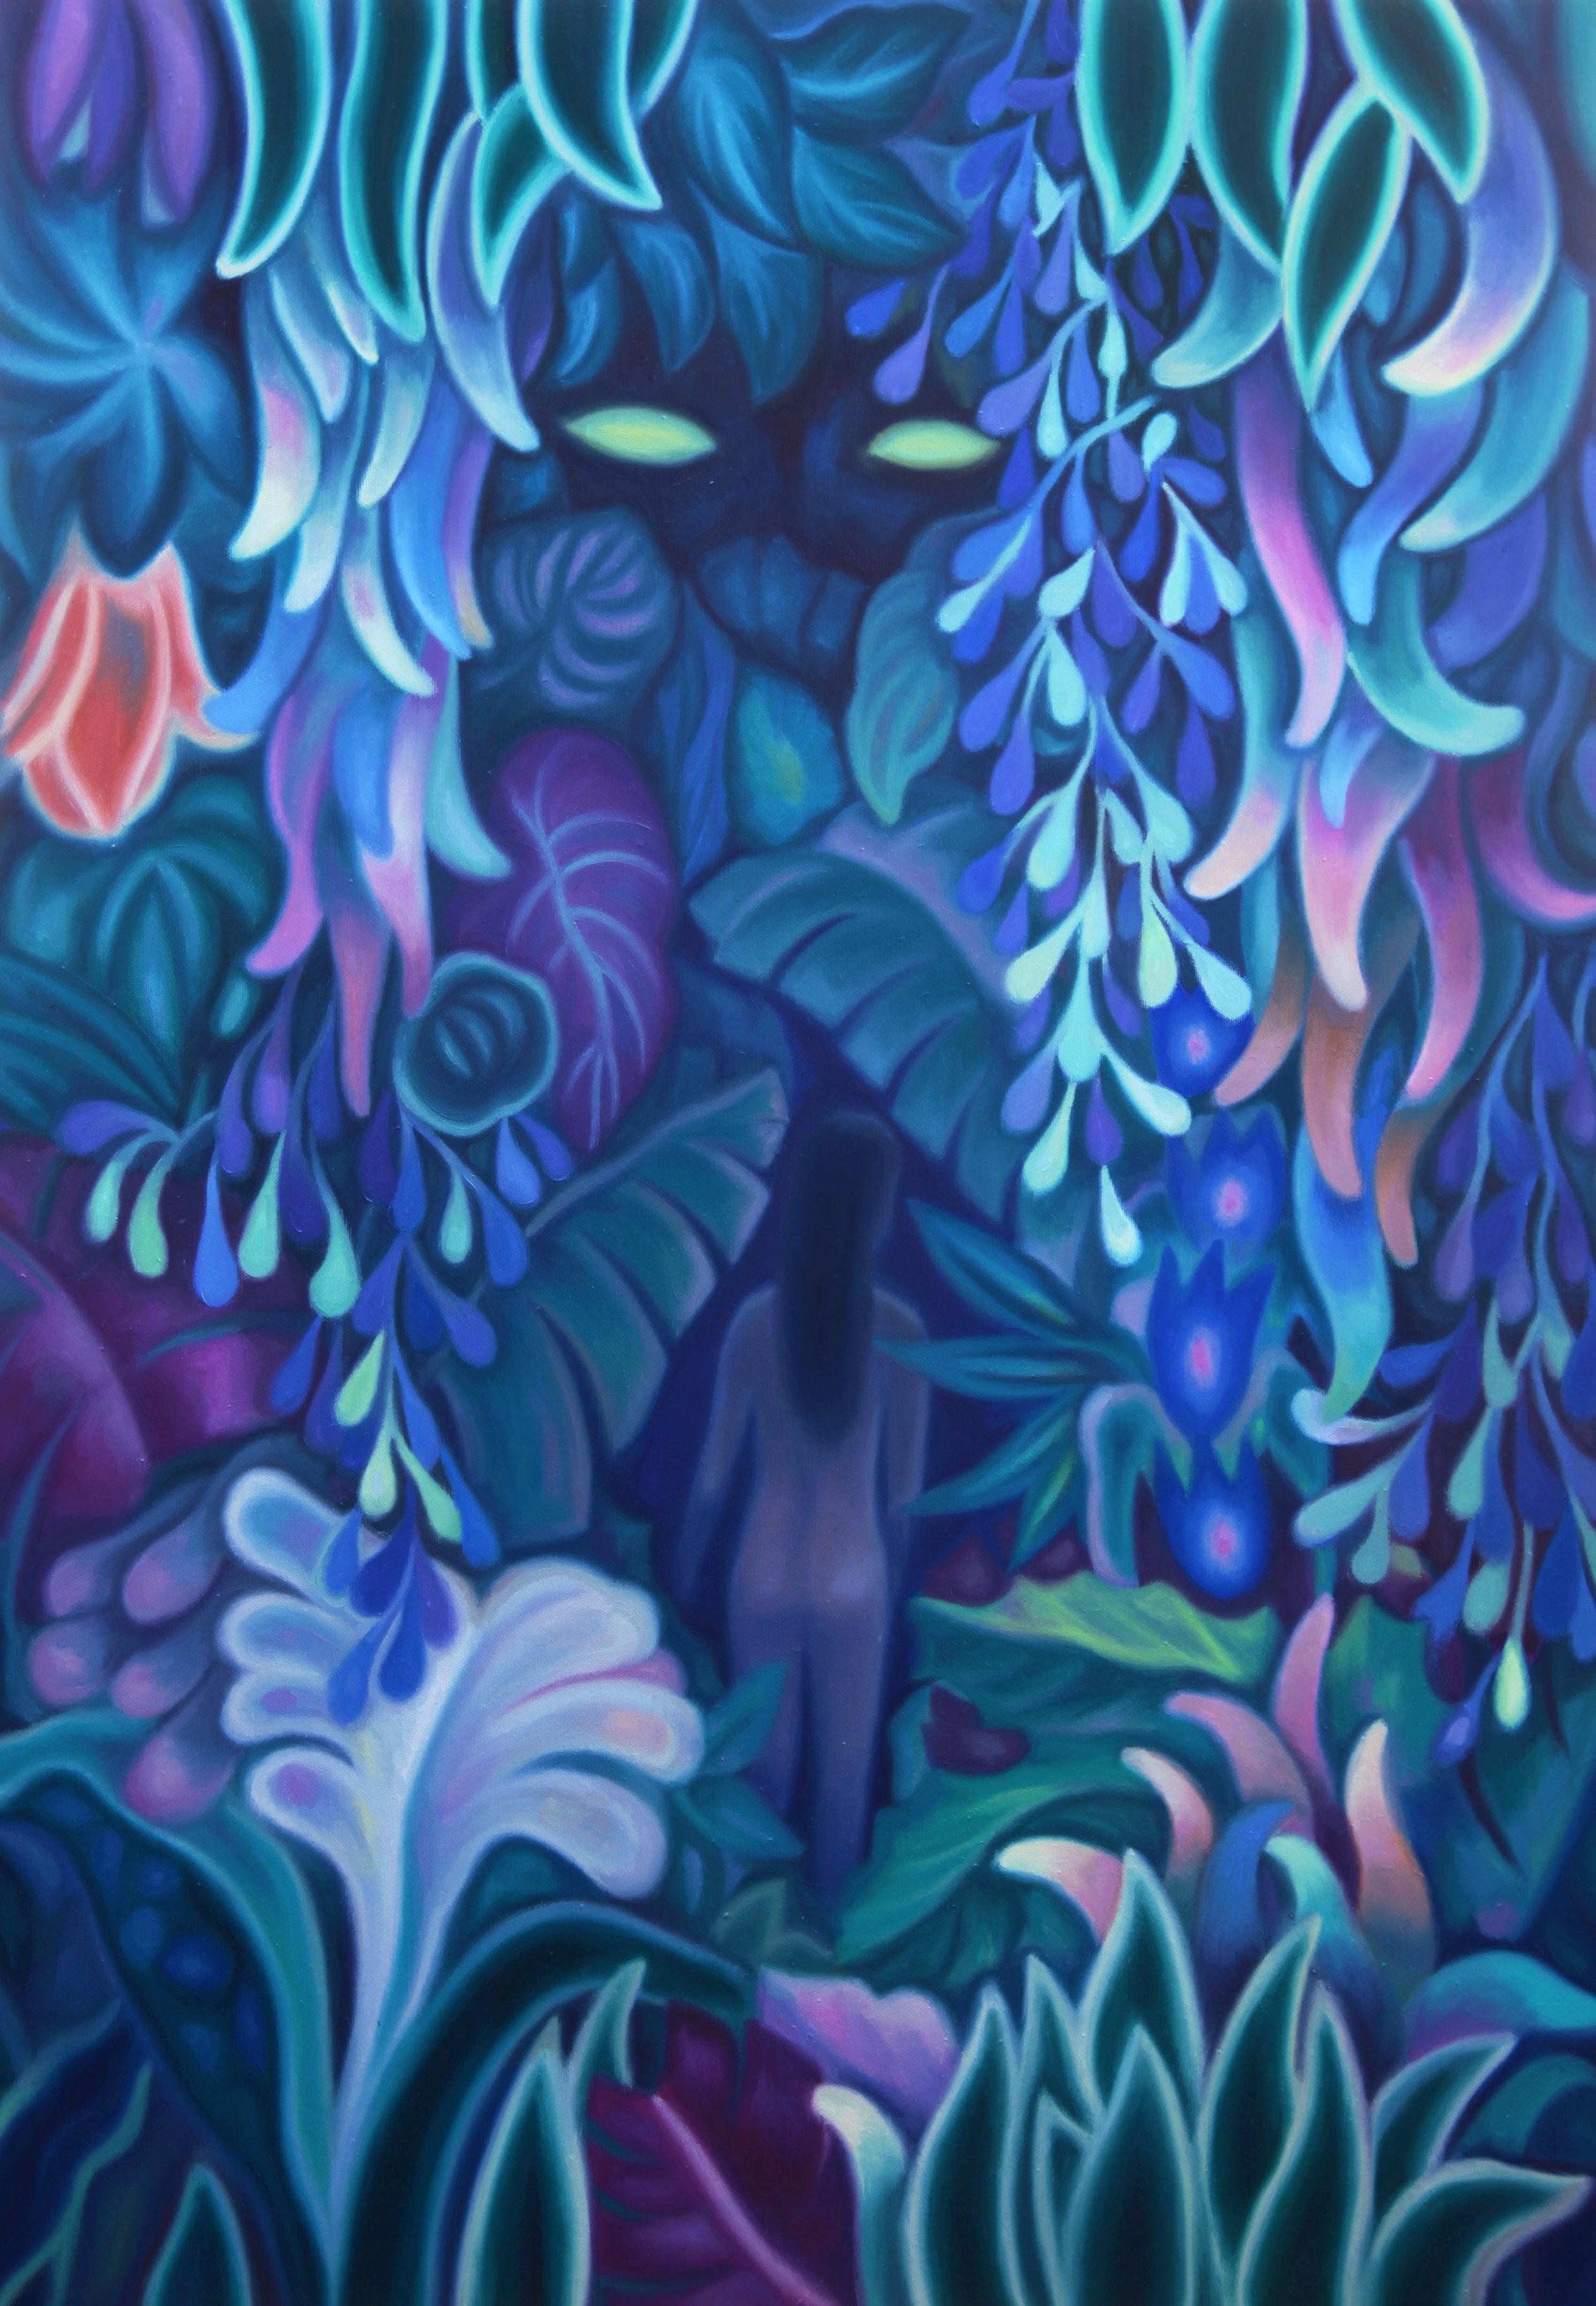 Night walk  , 2019, oil on linen canvas, 116x81cm